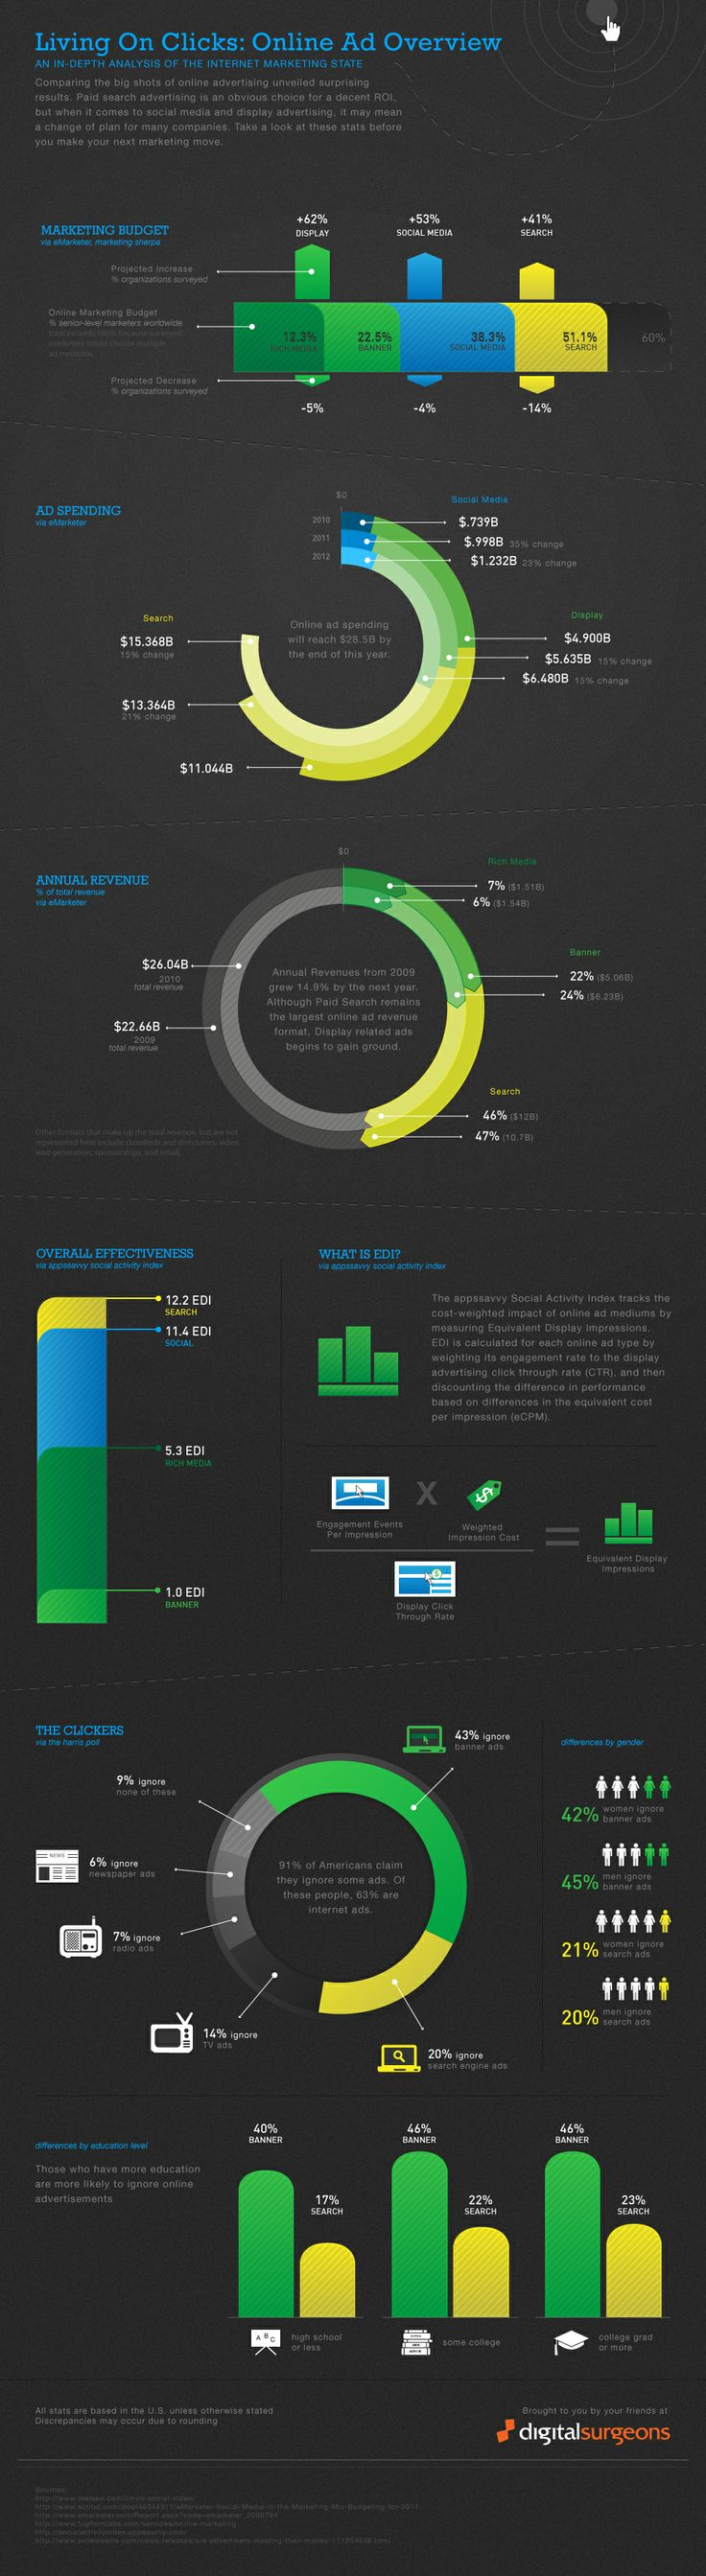 analytics, livin on clicks: online ad overview